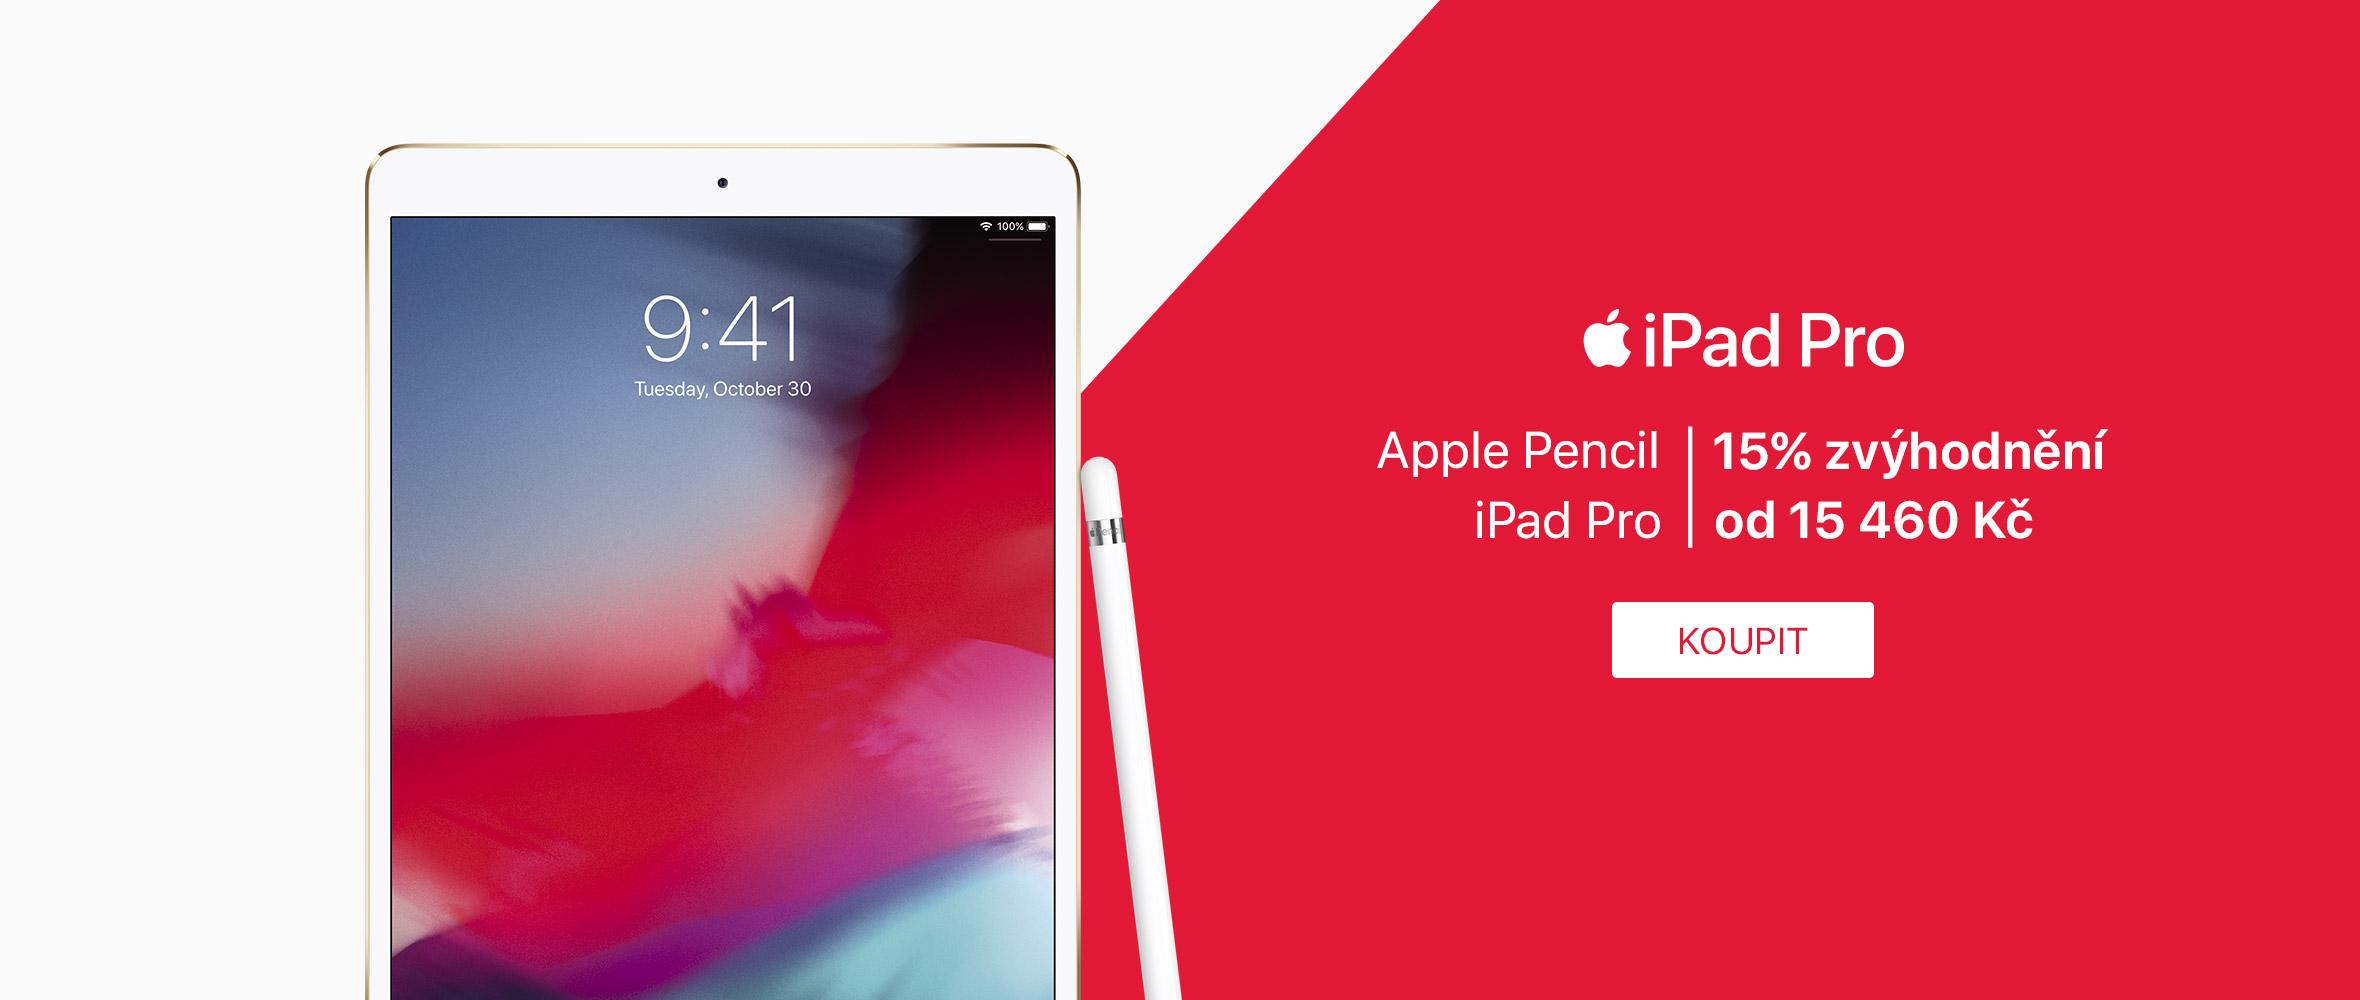 iPad Pro + Apple Pencil